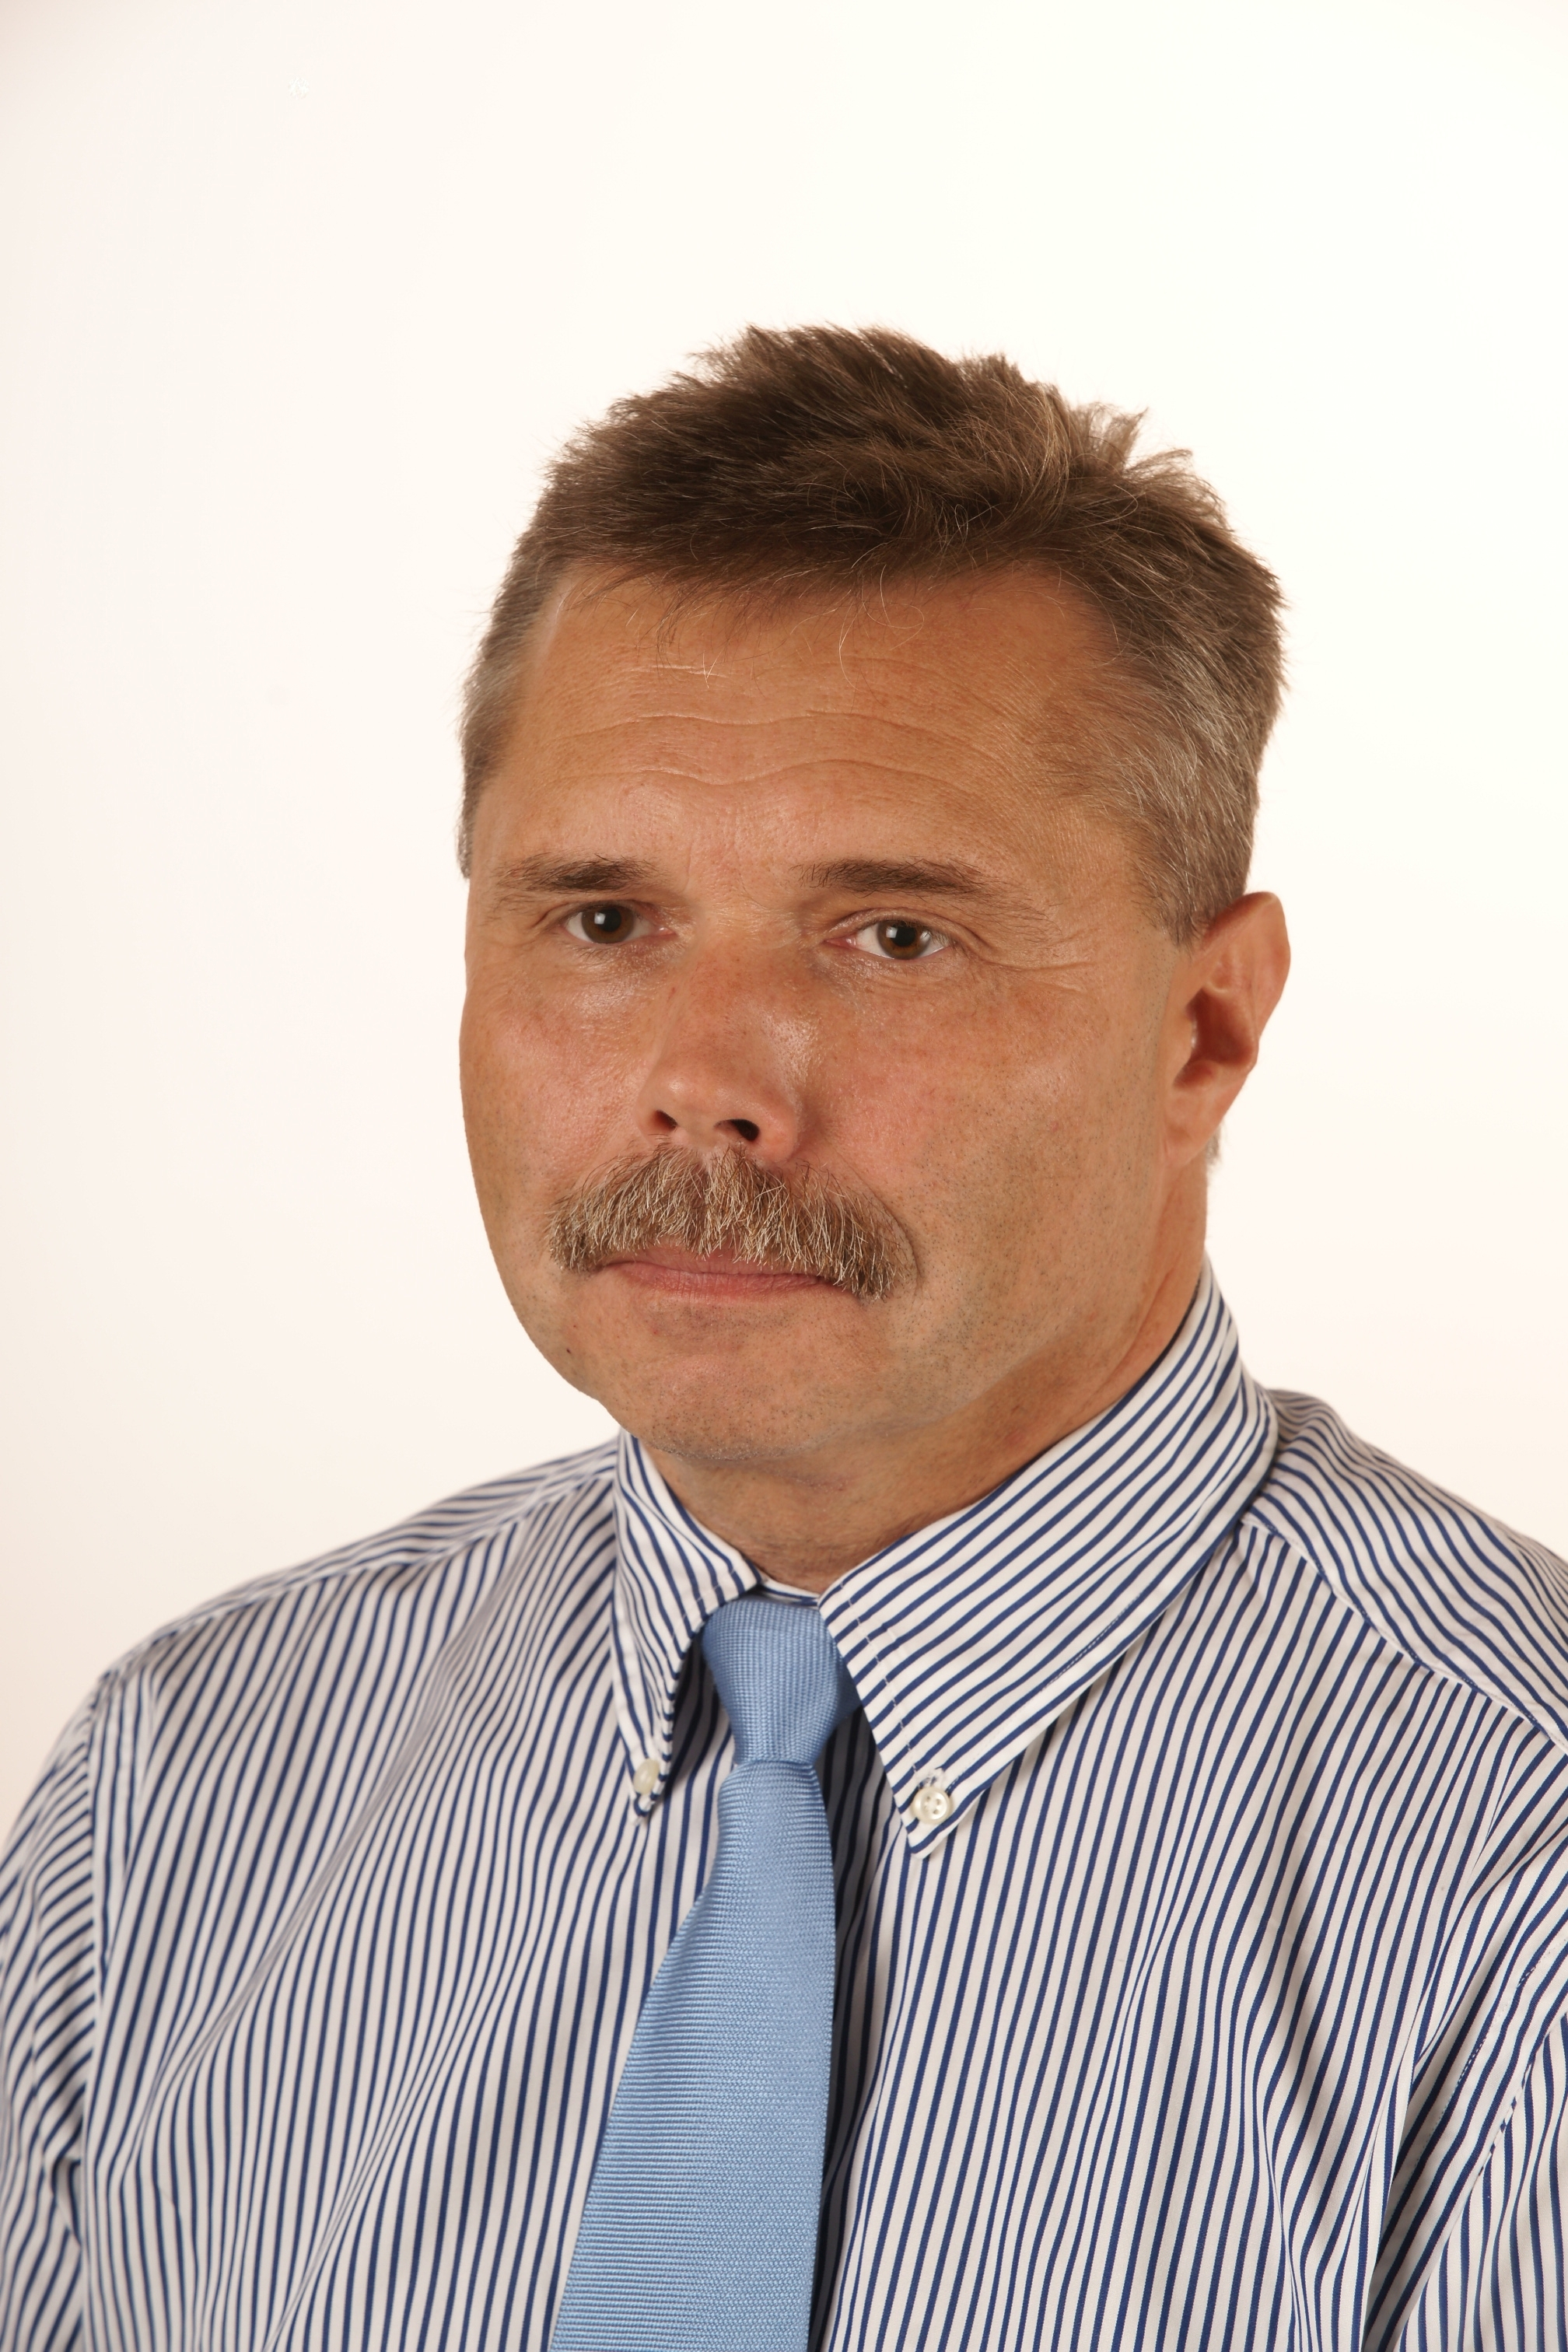 Kierownik Katedry: prof. dr hab. n. med. Mariusz Dubiel